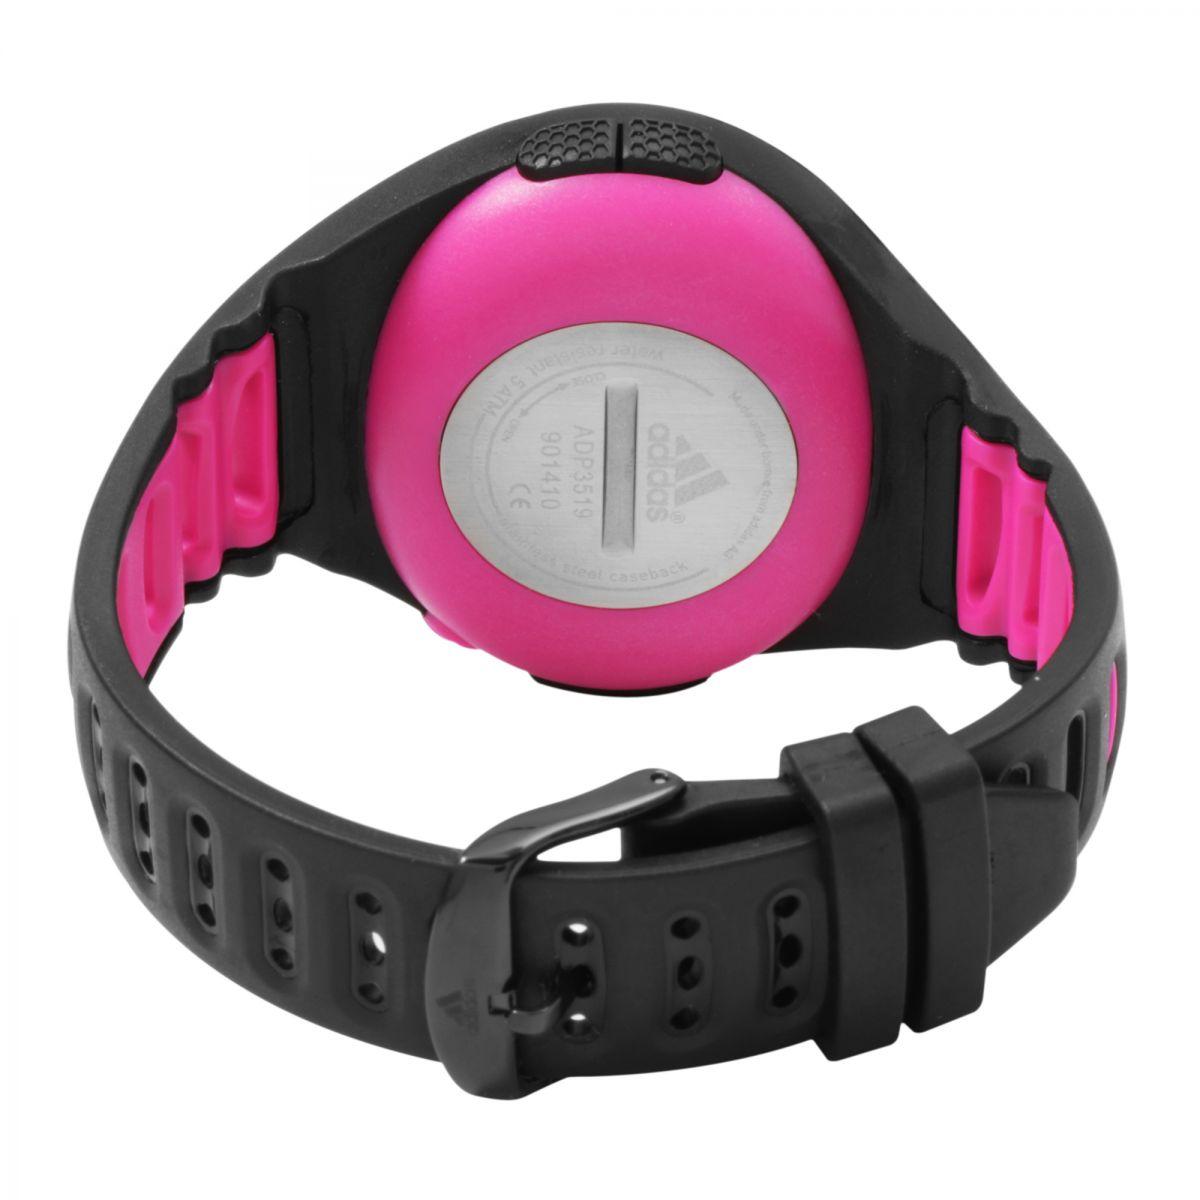 Reloj Adidas Midsize Performance Adizero Midsize Chronograph Alarm Adidas Chronograph para mujer 8295c12 - amningopskrift.website